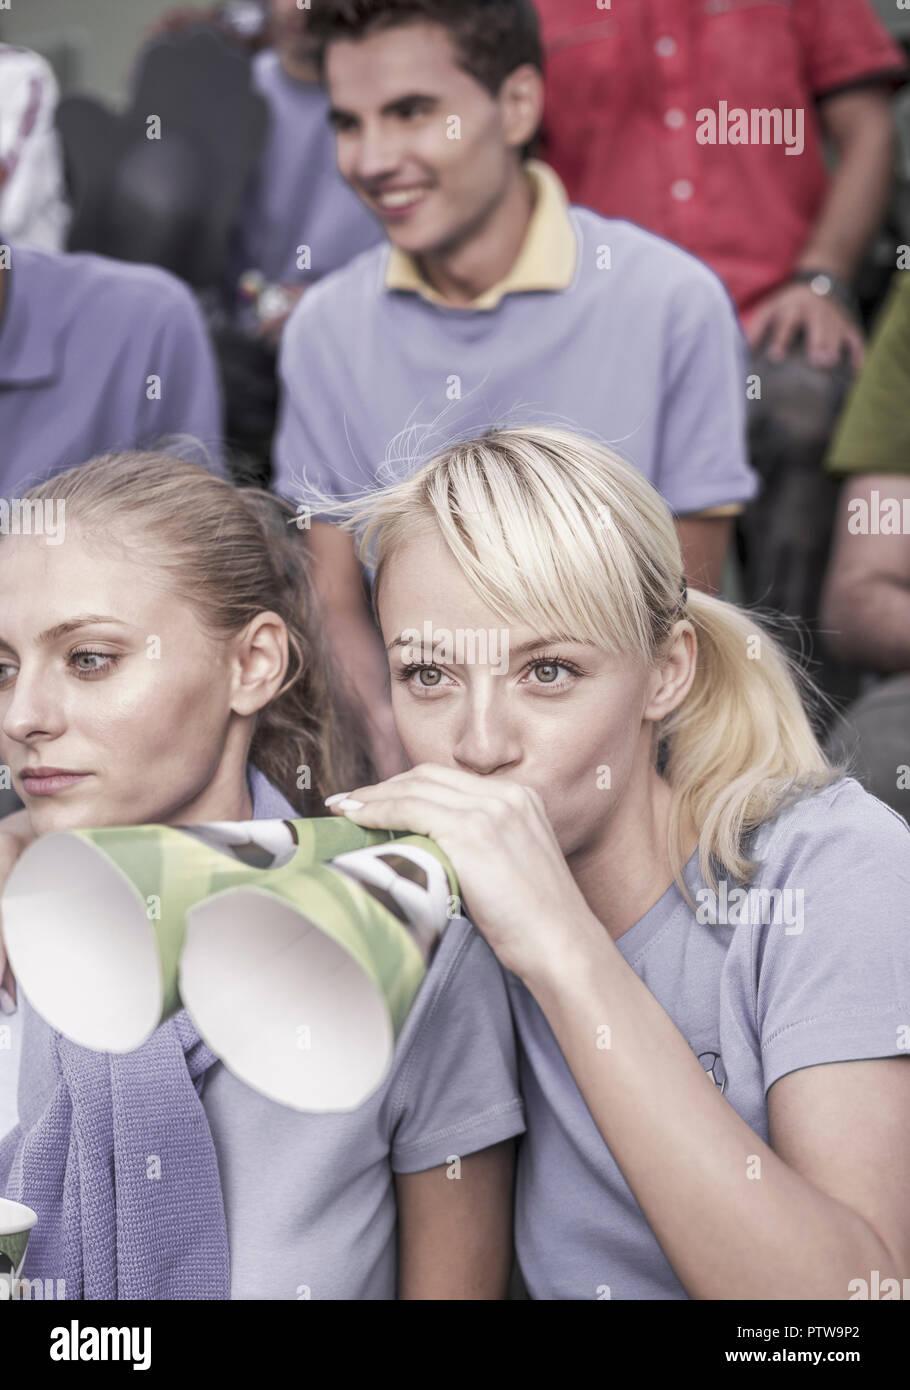 Fussballfans, Frauen mit Troete (model-released) - Stock Image